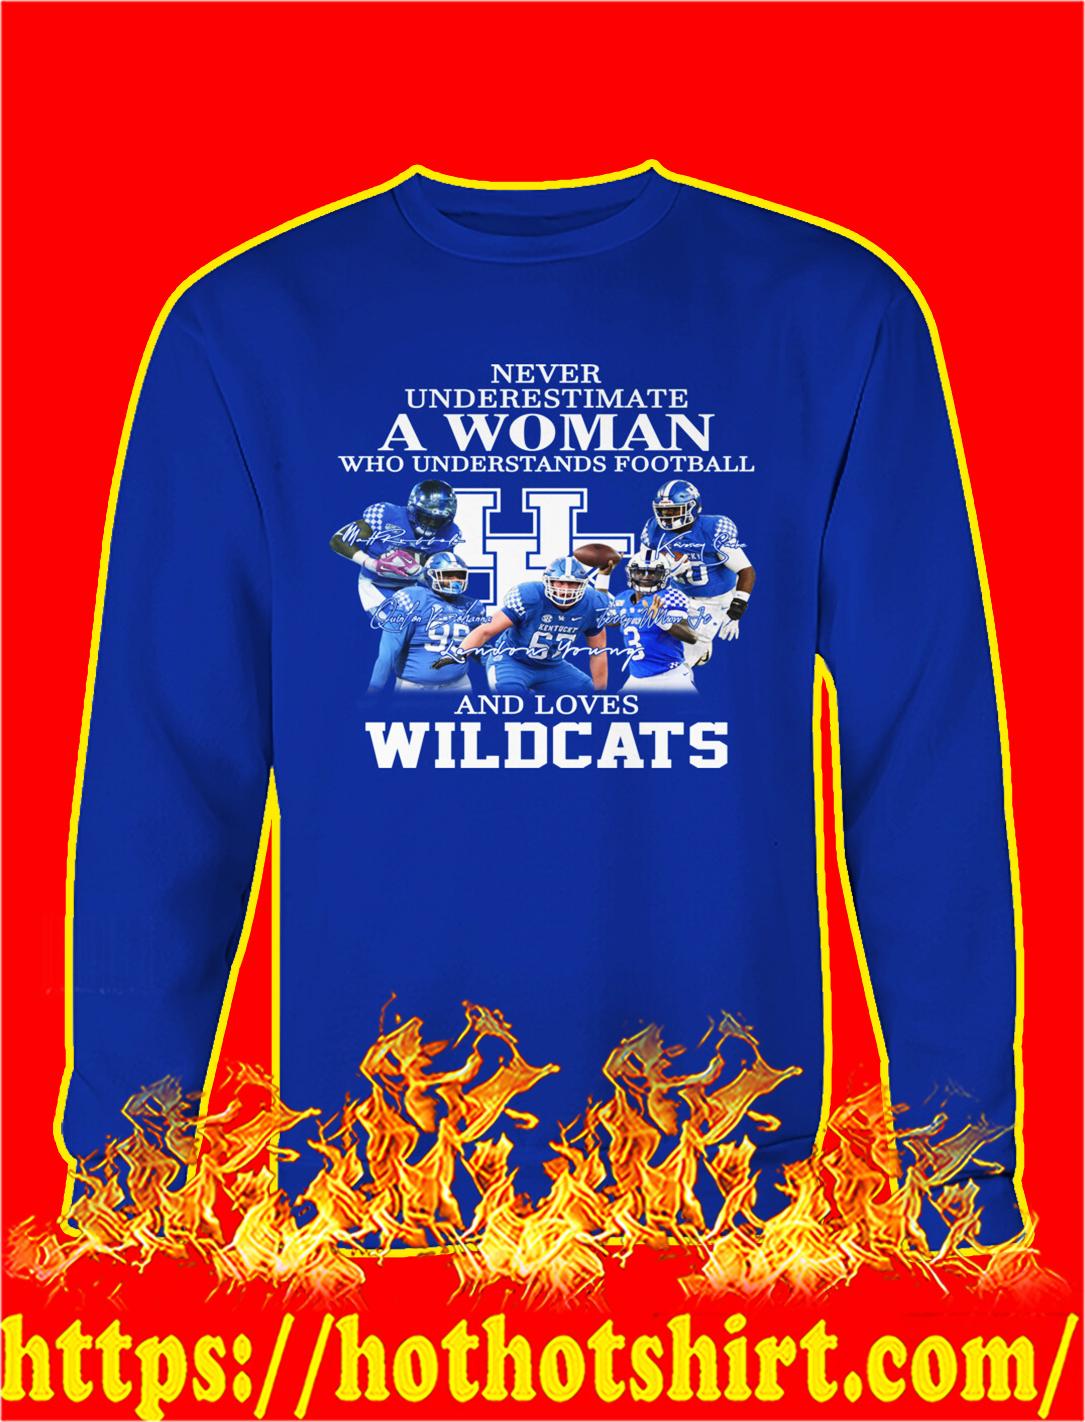 Never underestimate a woman understands football and loves wildcats sweatshirt